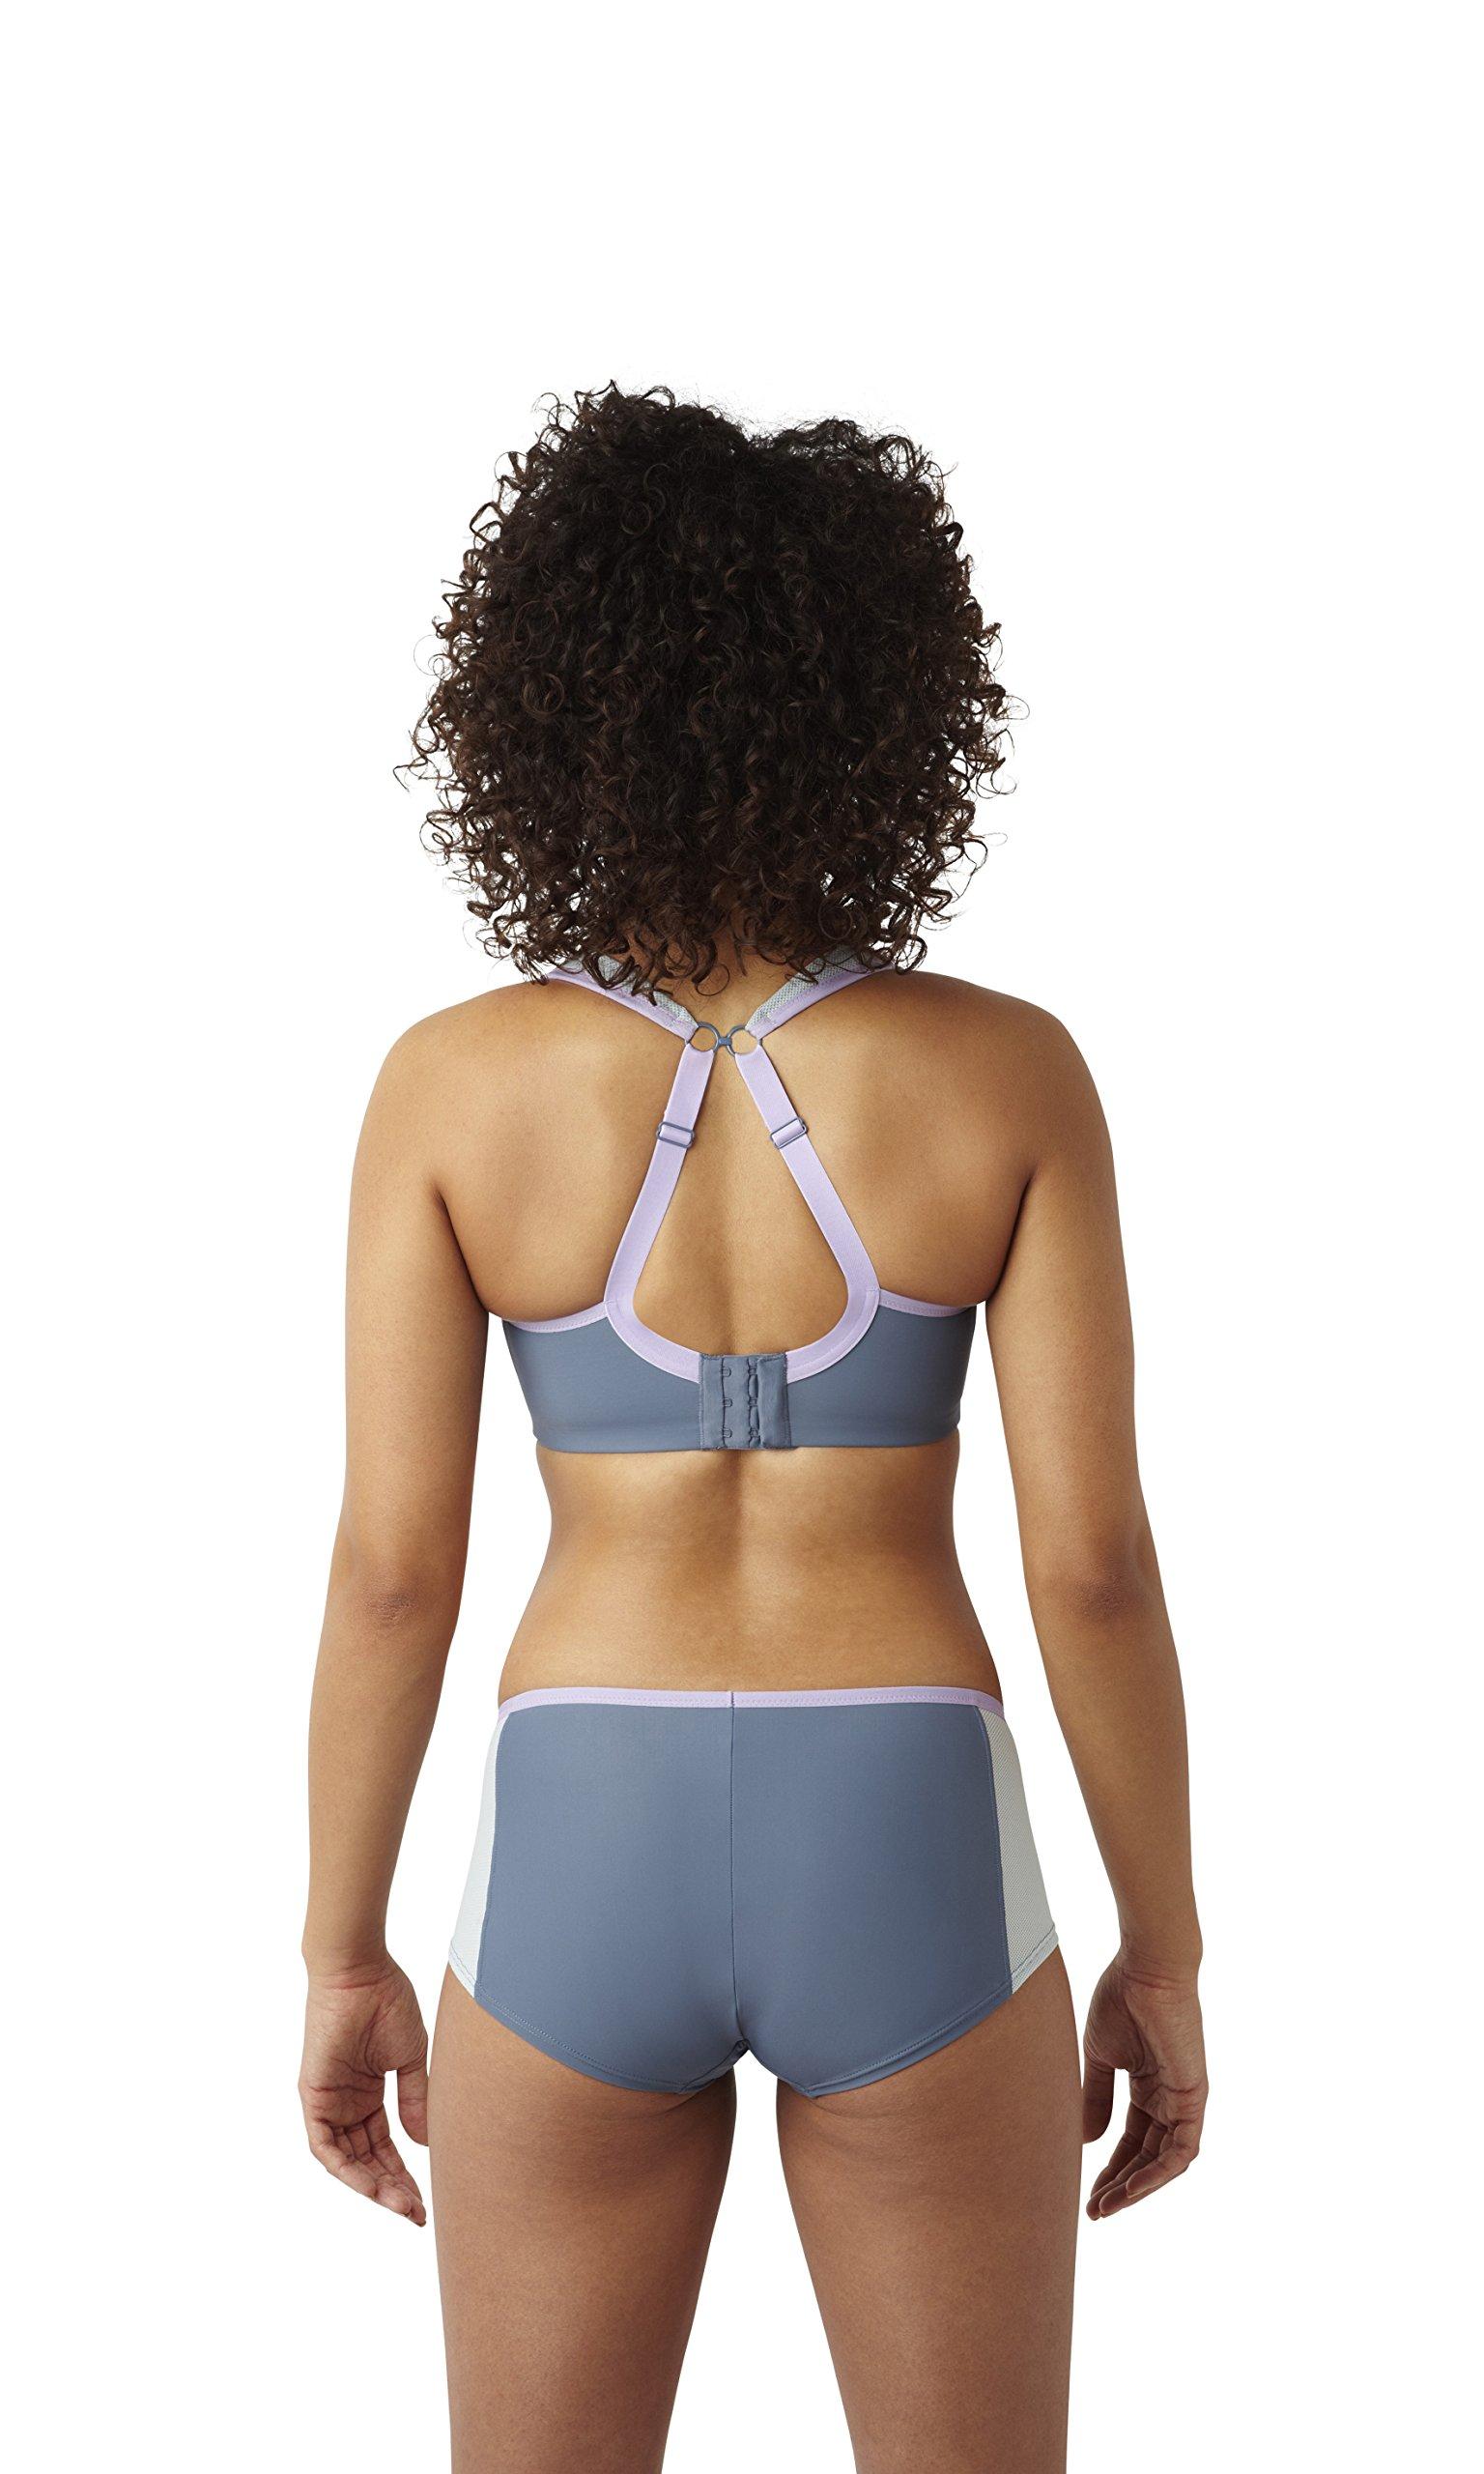 Panache Women's Plus Size Wired Sports Bra, Grey 28DD by Panache (Image #6)